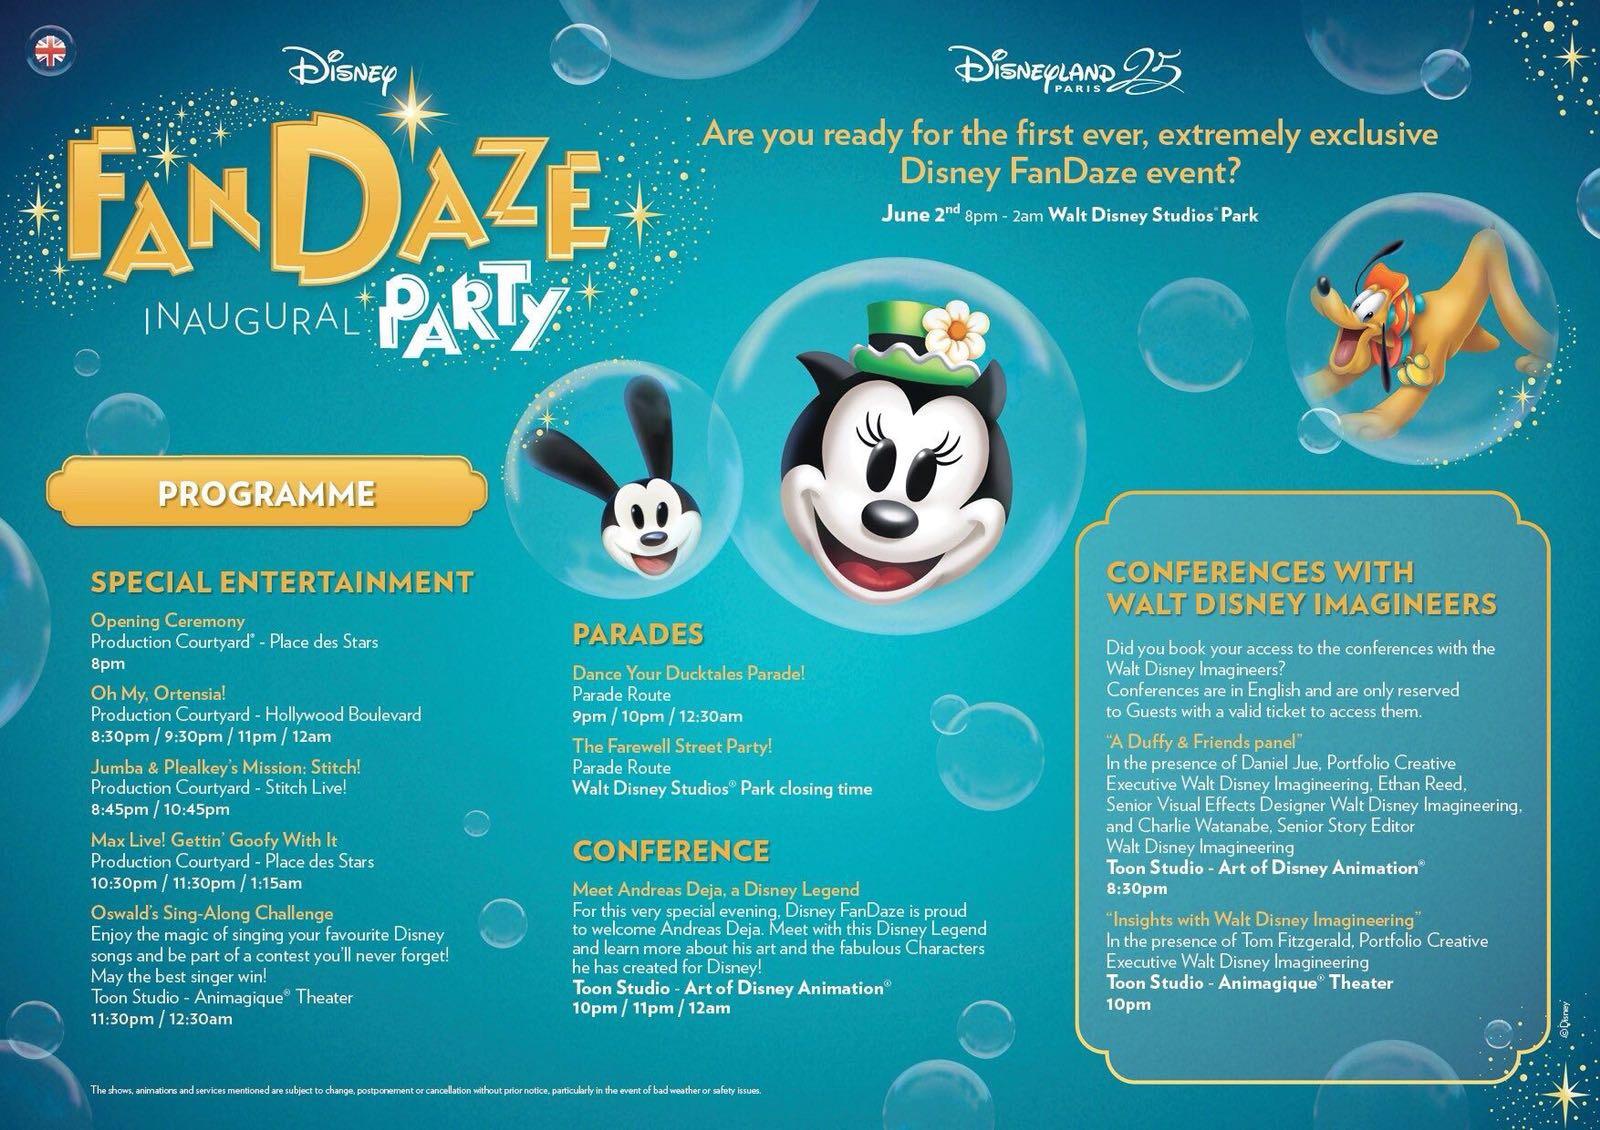 FanDaze Party Programme